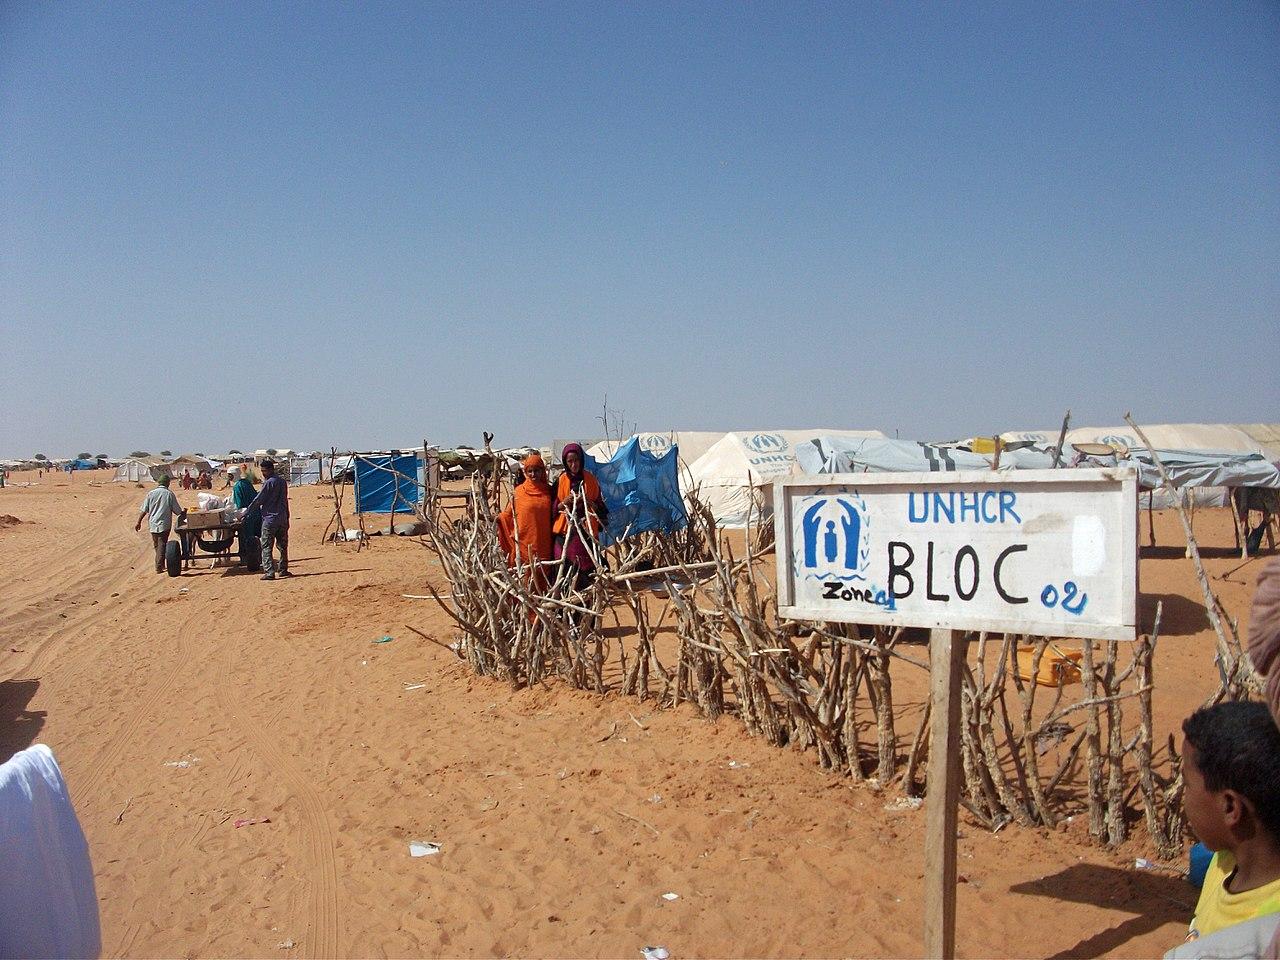 Civilians caught between Mali terrorists, troops - المدنيون محاصرون بين الإرهابيين والجيش في مالي - Des civils pris entre les terroristes et l'armée au Mali (8492052285).jpg